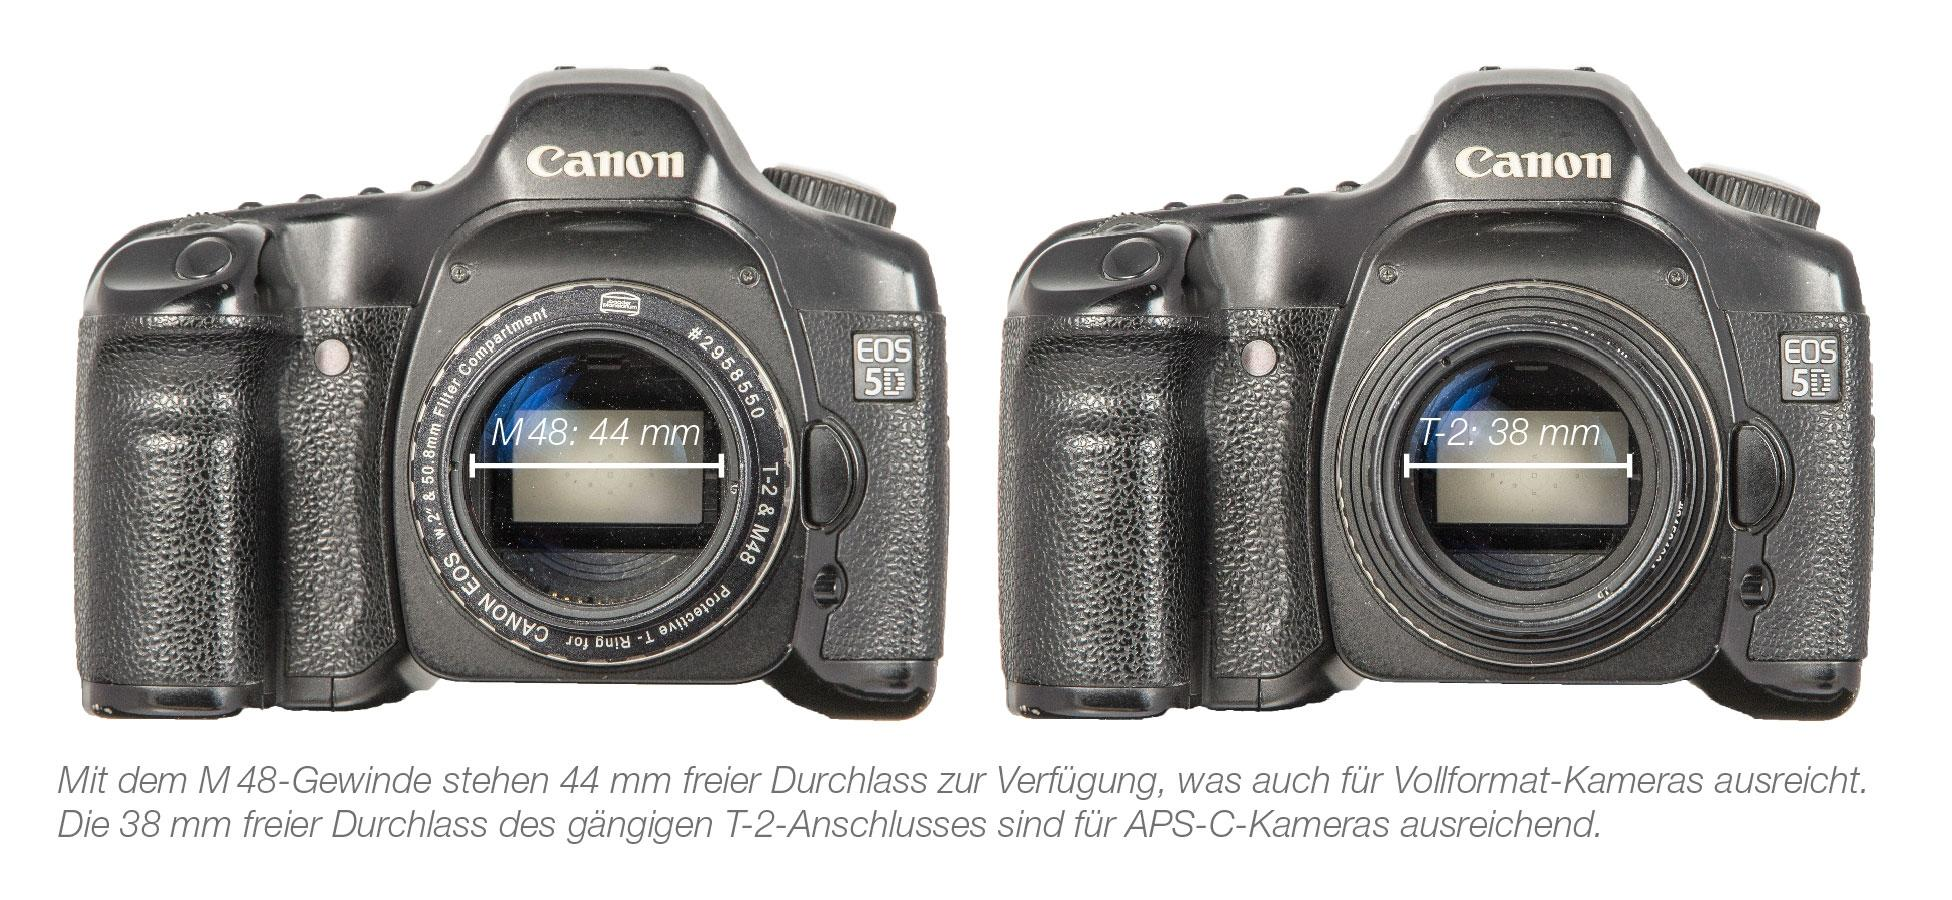 mpcc-cameras.jpg